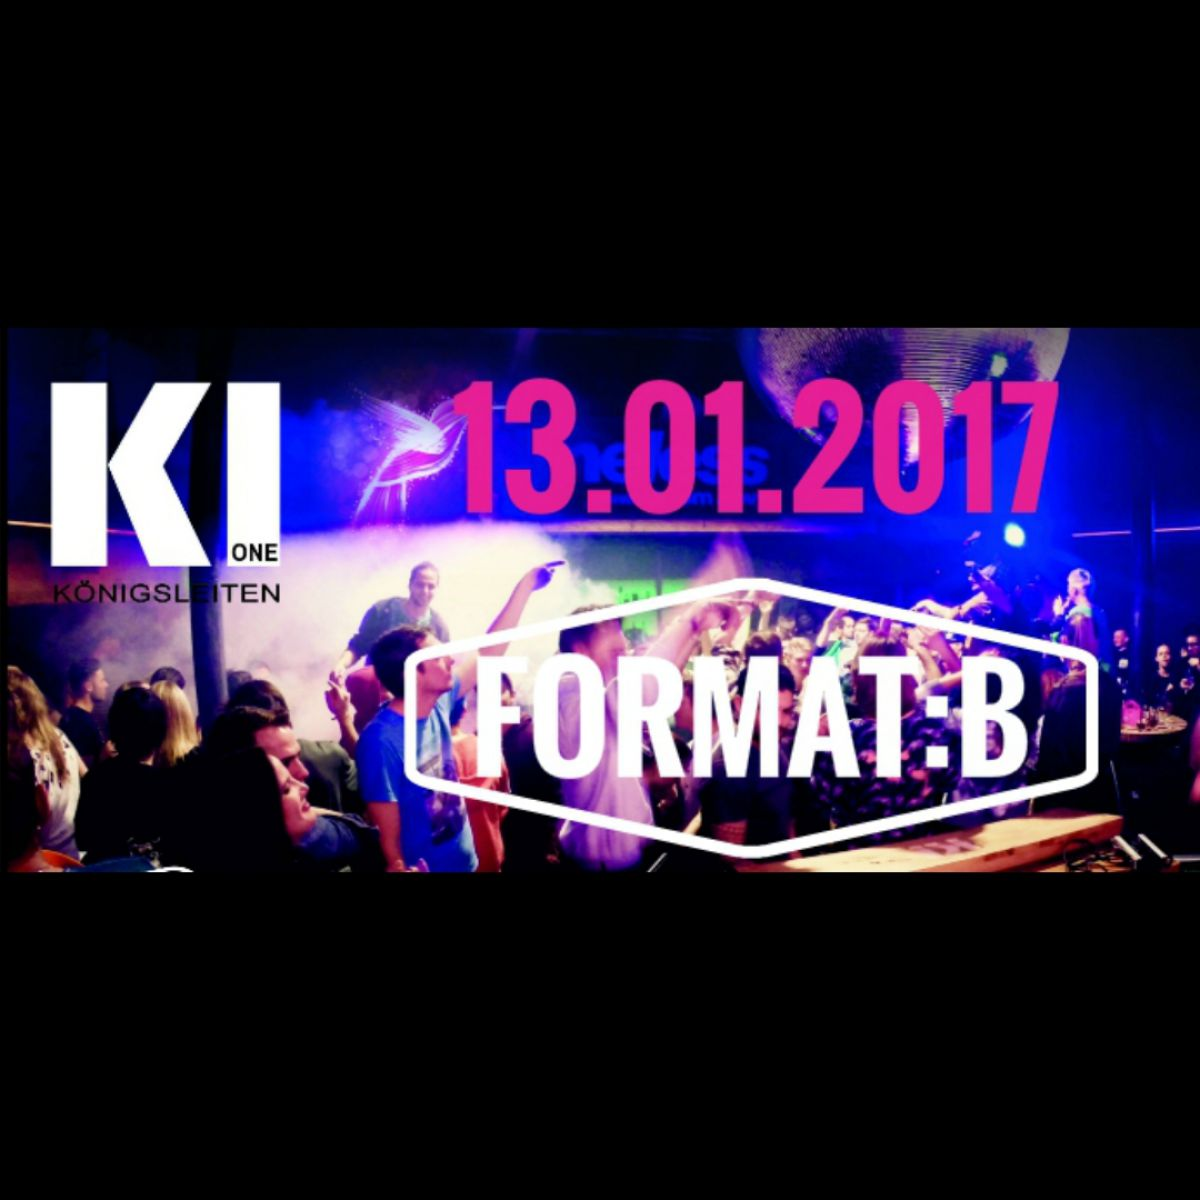 Ski & Dance mit FORMAT:B & Skipass | 11. bis 14.01.17 für 3 ÜN inkl. Skipass